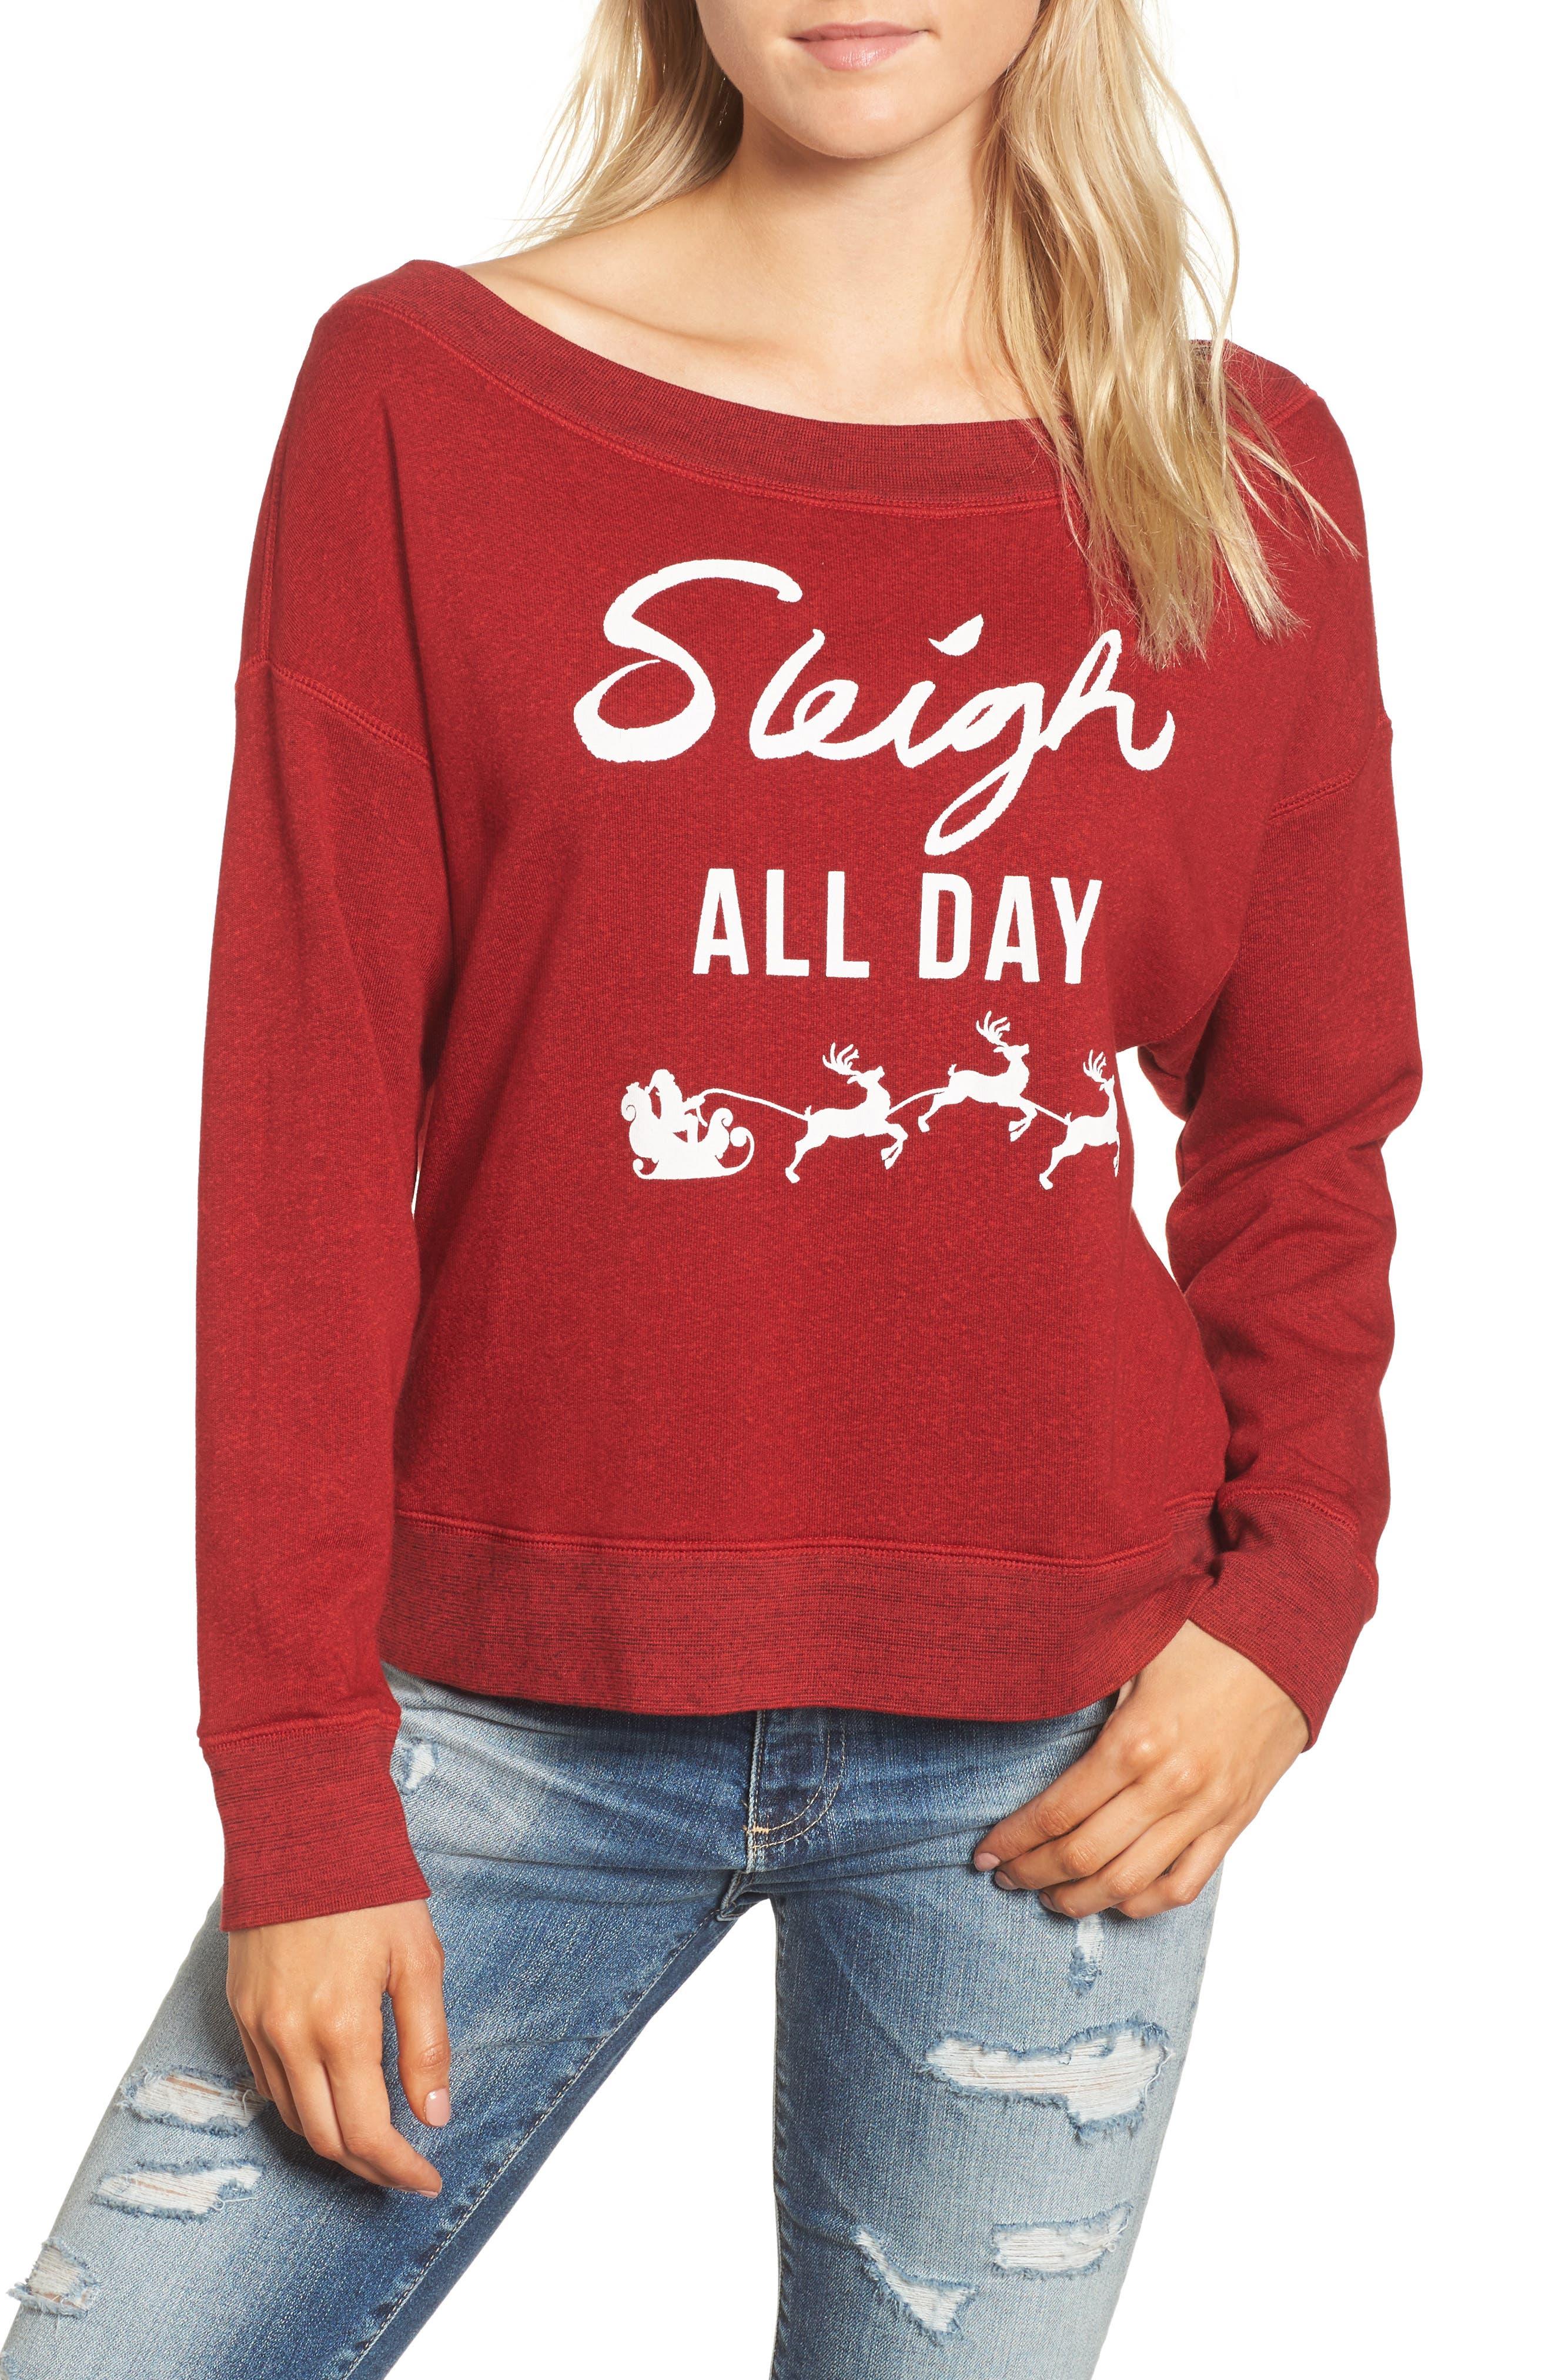 Sleigh All Day Sweatshirt,                             Main thumbnail 1, color,                             604